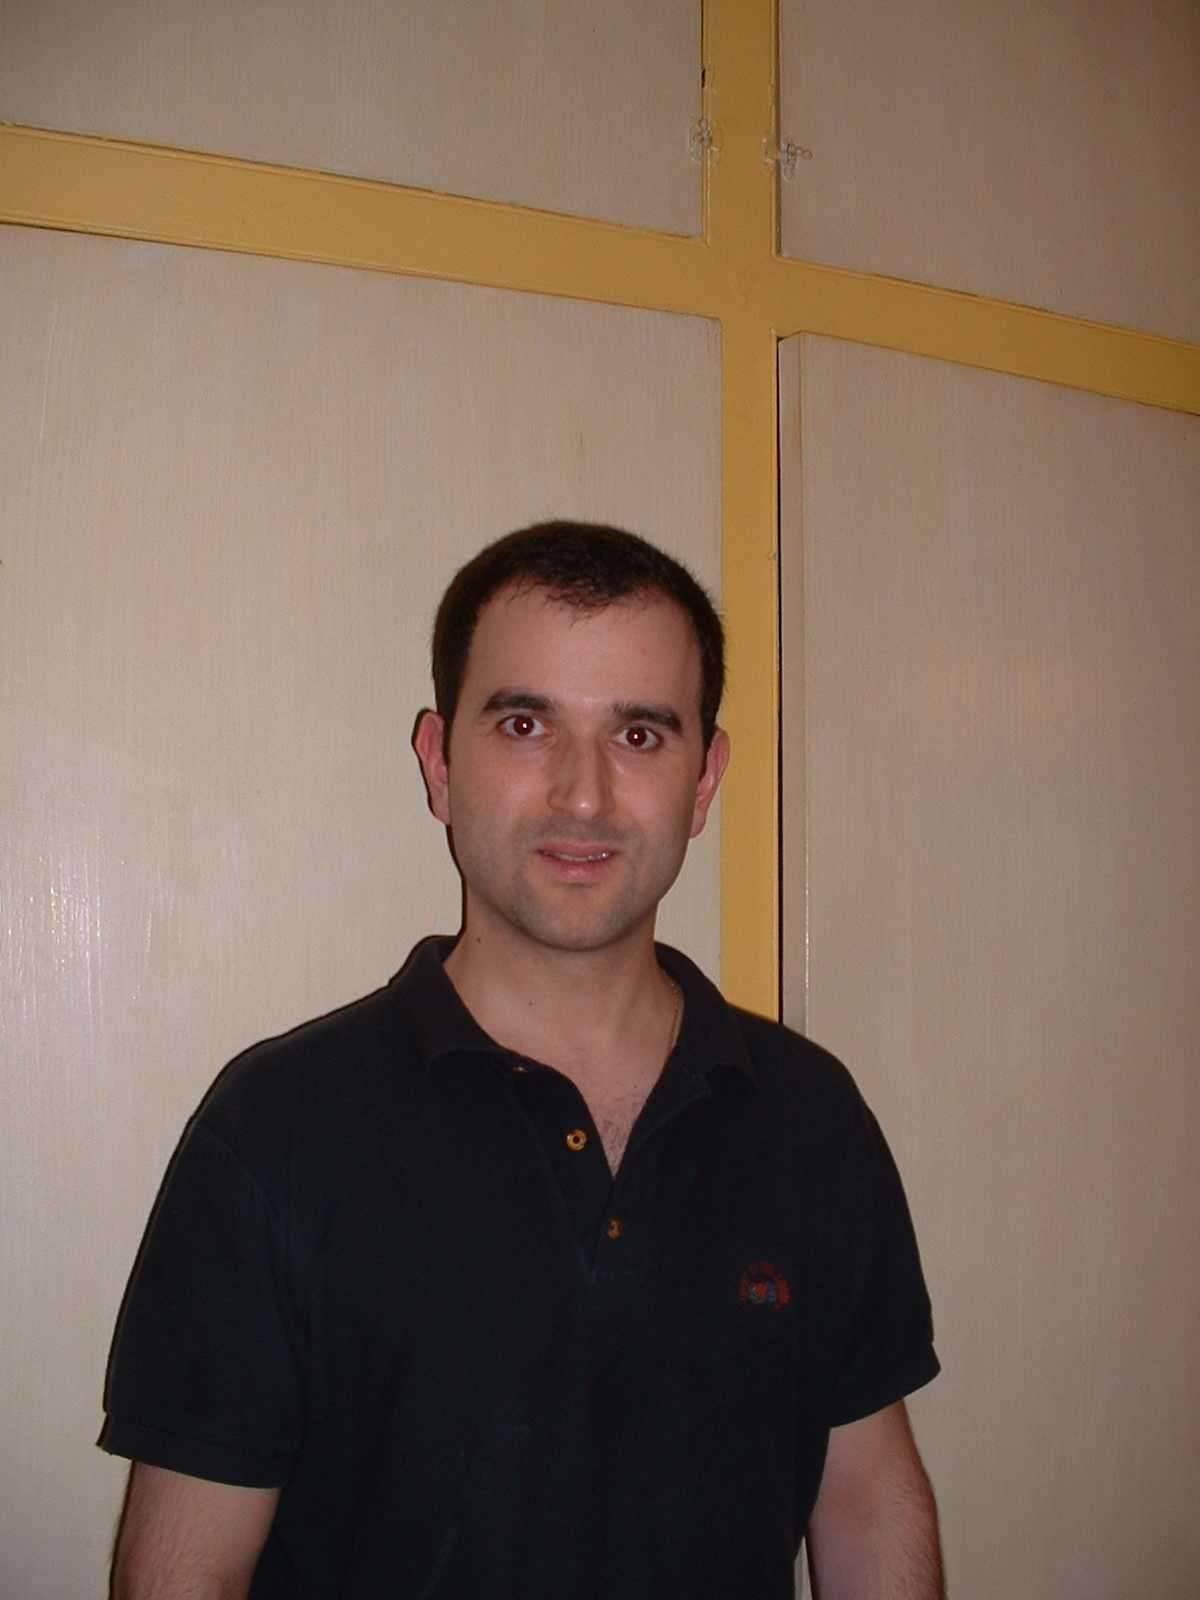 Online dating user image 3